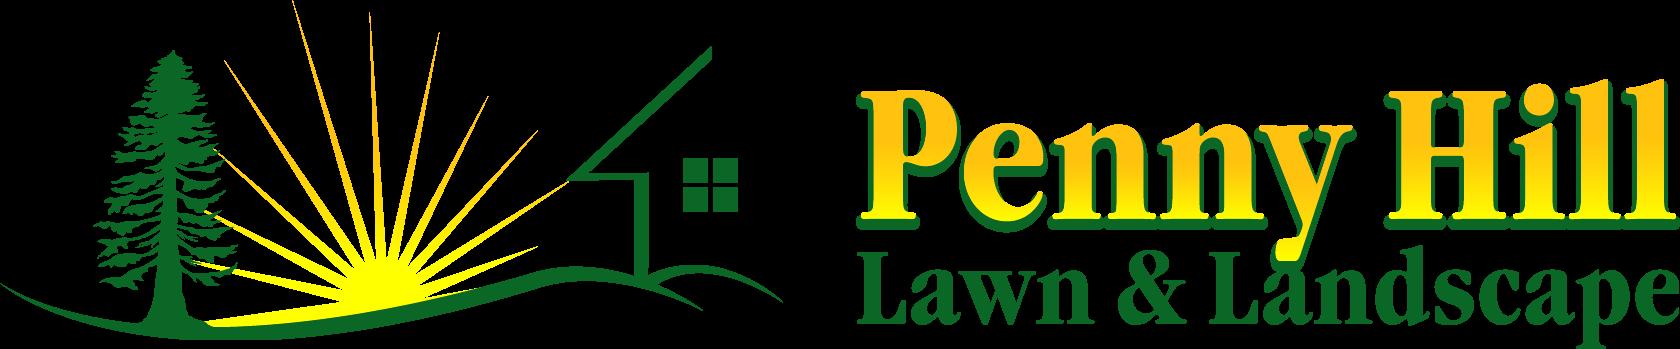 Penny Hill Lawn & Landscape